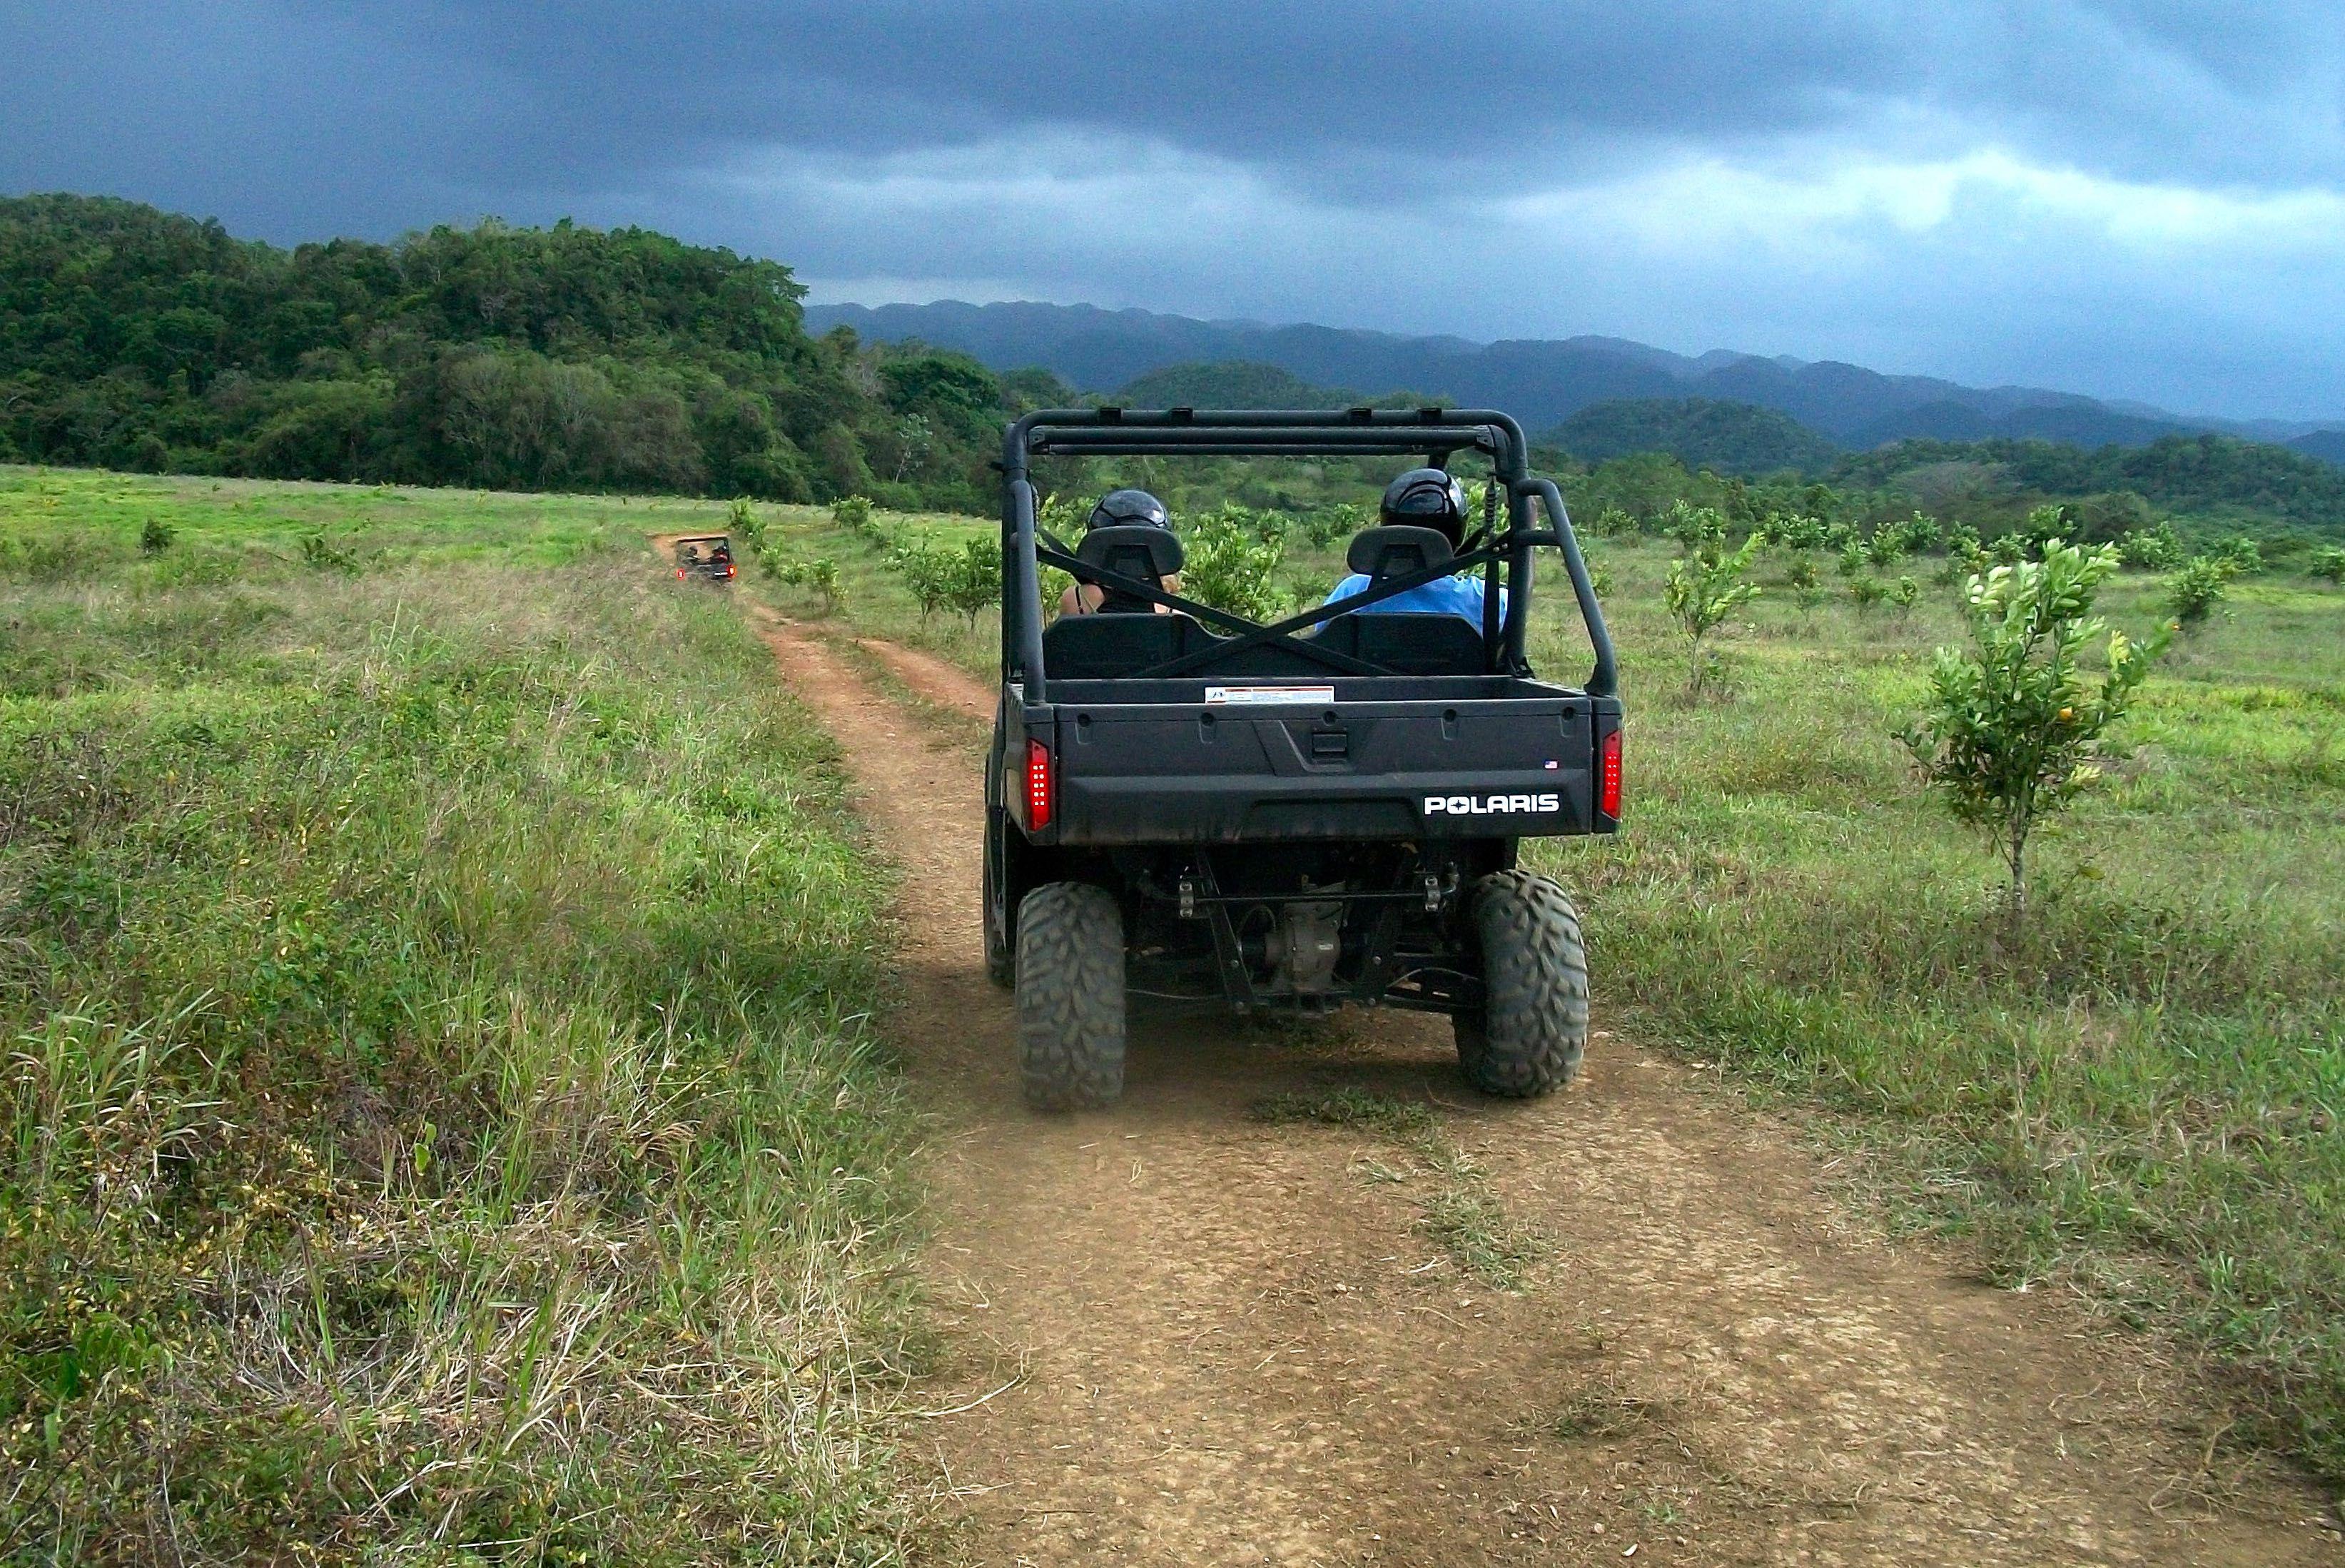 Four-wheeling at Good Hope Plantation, Jamaica